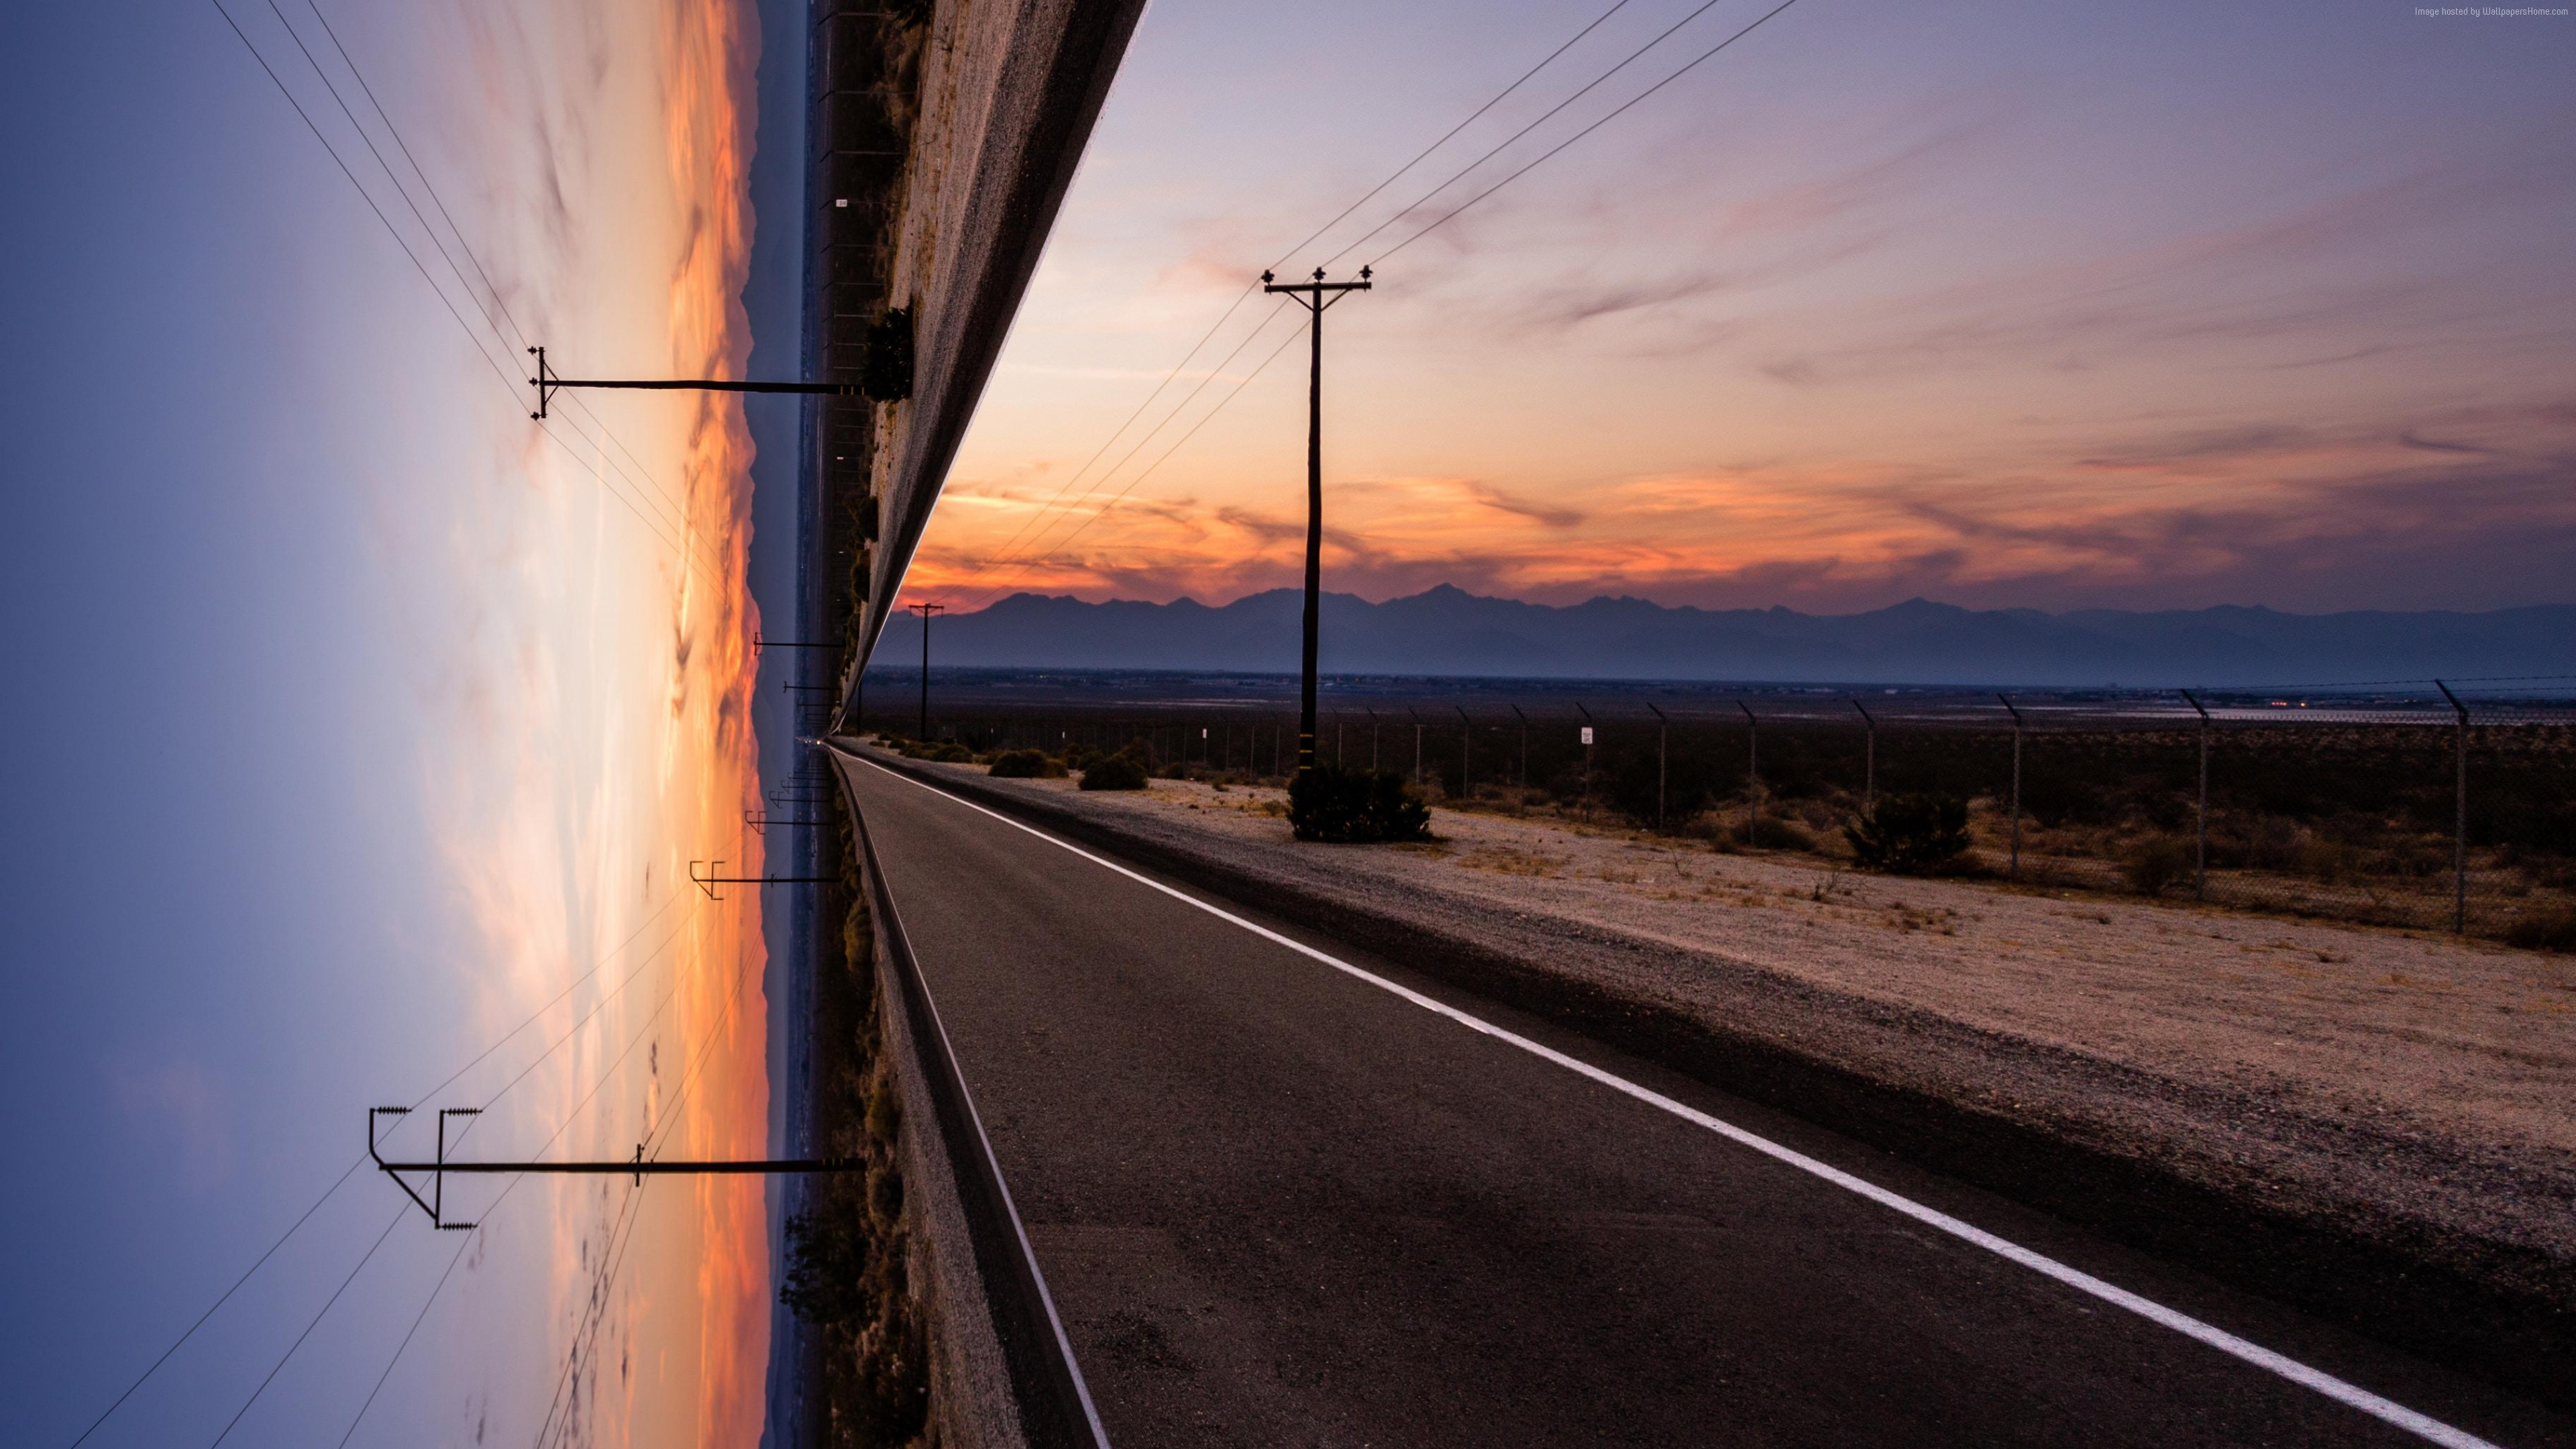 Wallpaper Road Sky Sunset Artwork 4k Nature Download